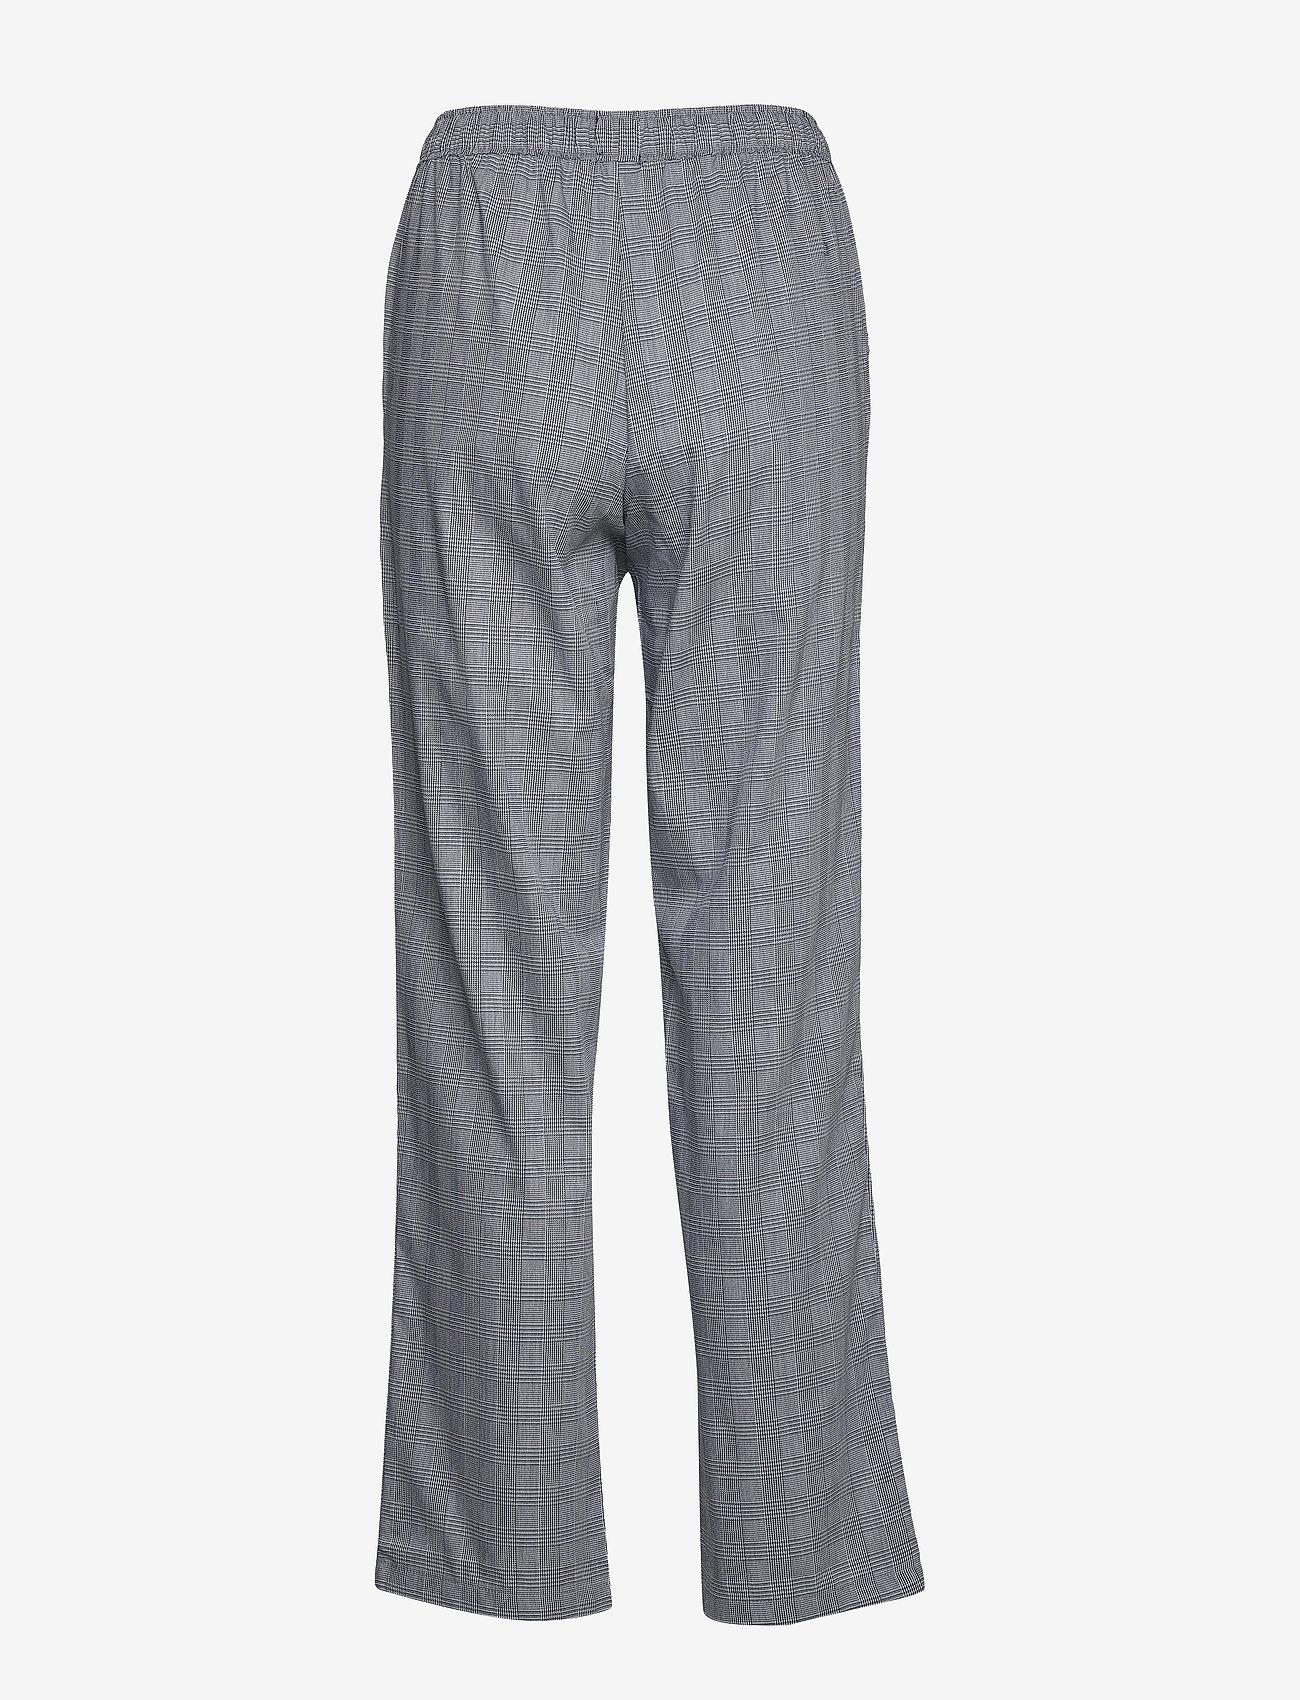 Schiesser - Long Pants - doły - nightblue - 1